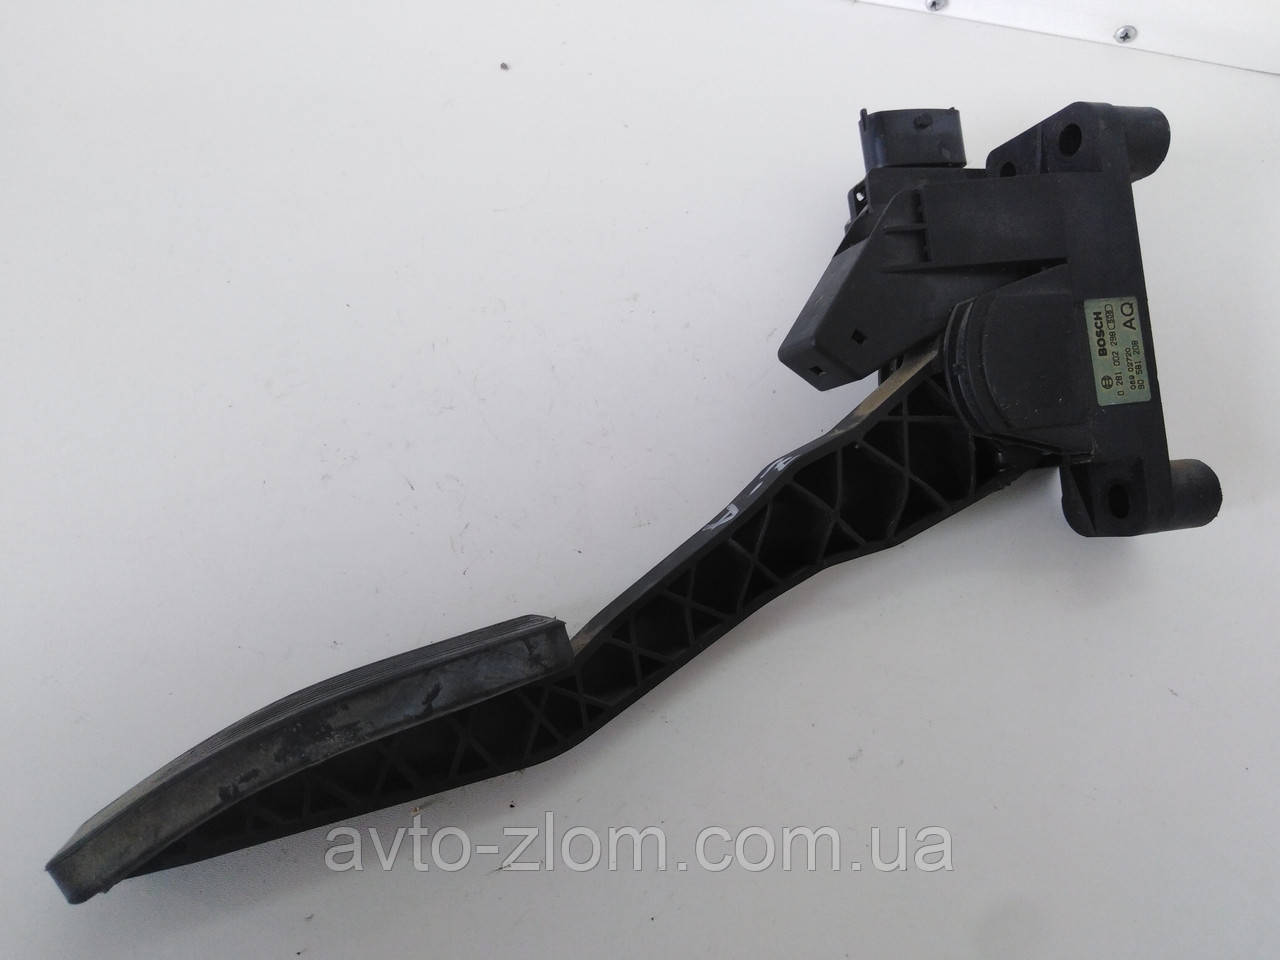 Педаль газа Opel Zafira A, Опель Зафира А. 90581208, 0281002298.